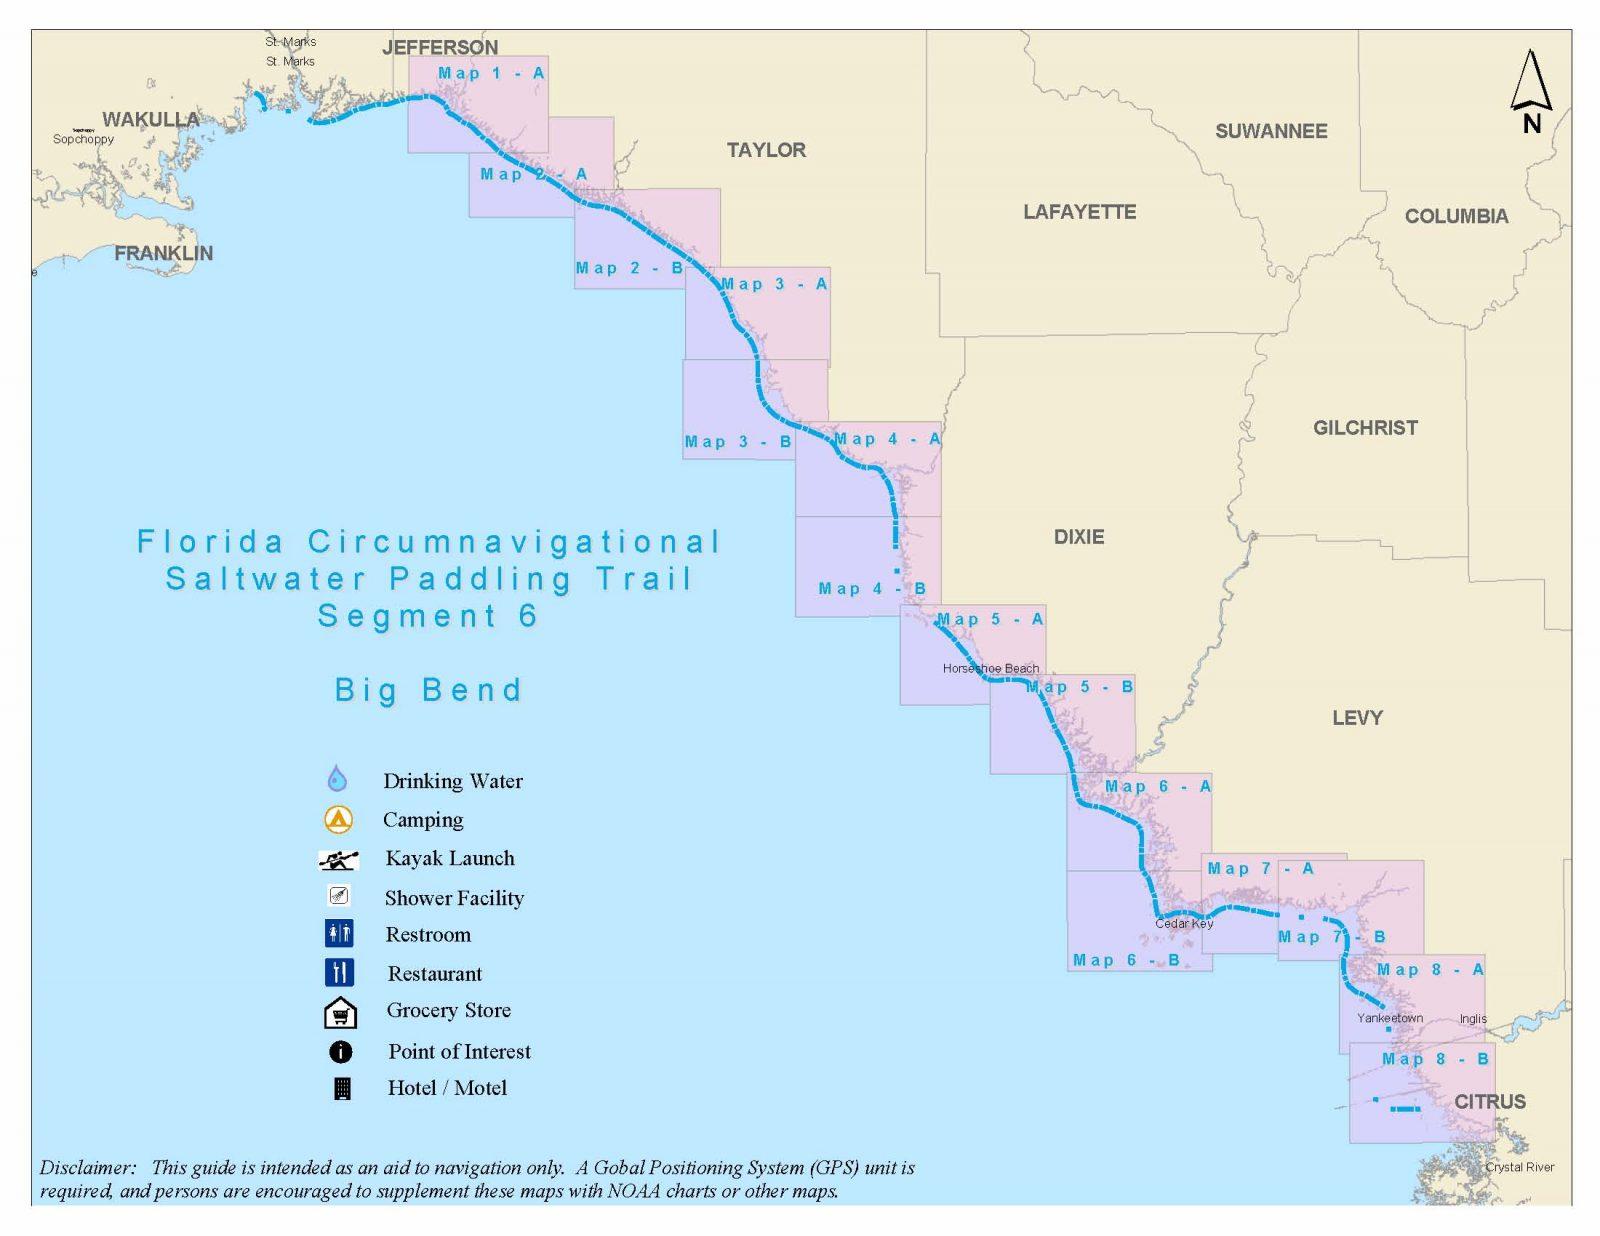 Florida Circumnavigational Saltwater Paddling Trail - Segment 6